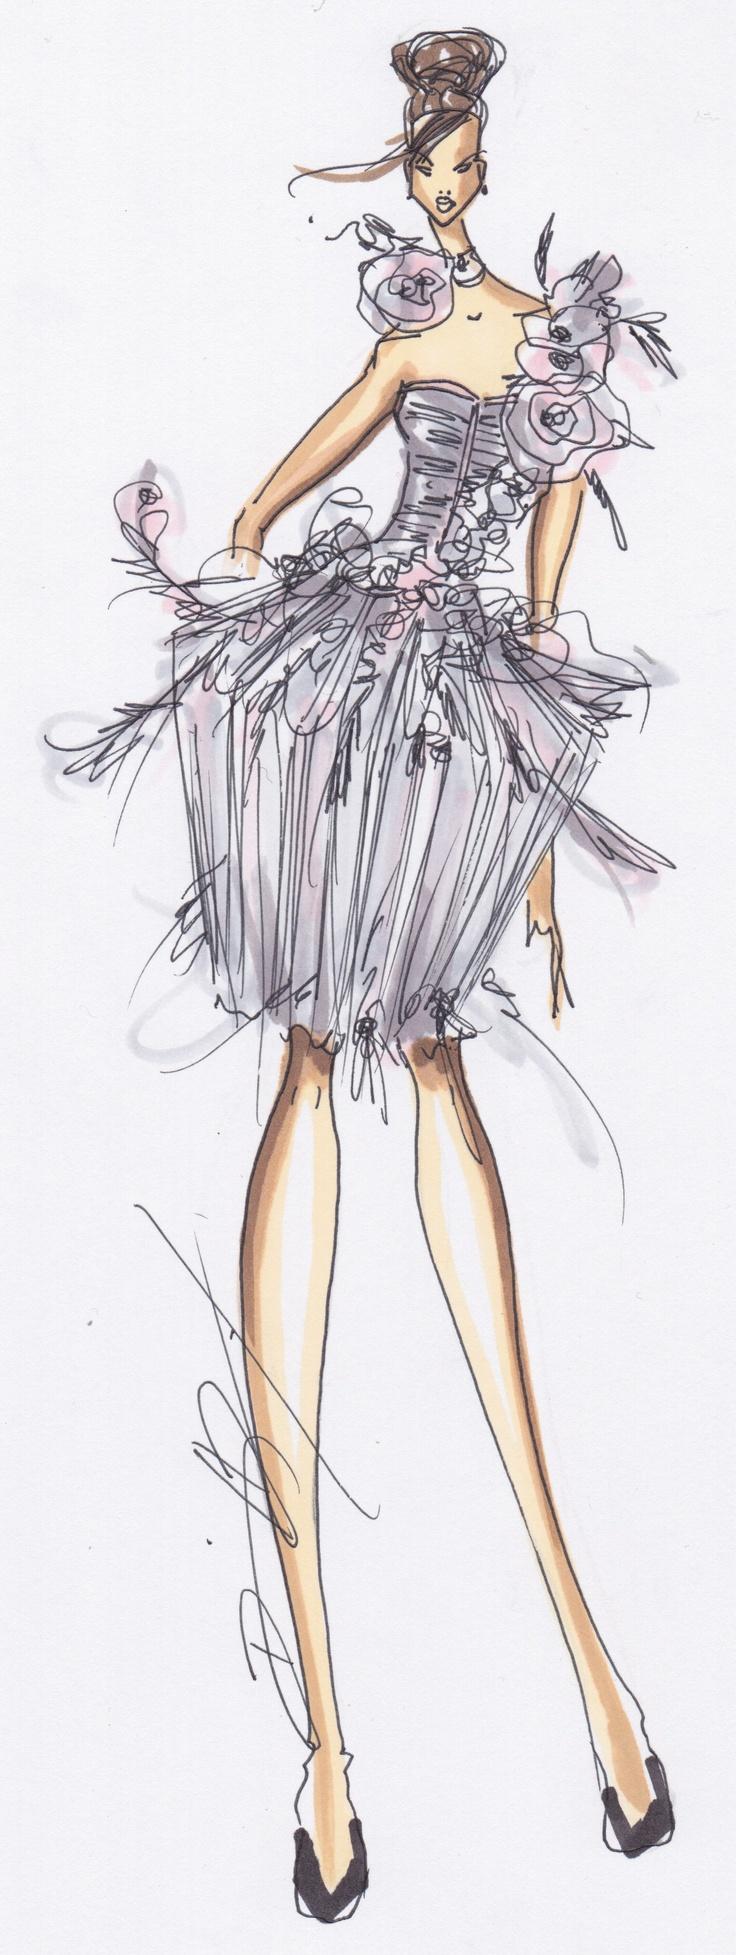 White-Cashmere-Collection-2013-David-Dixon-Sketch.jpg